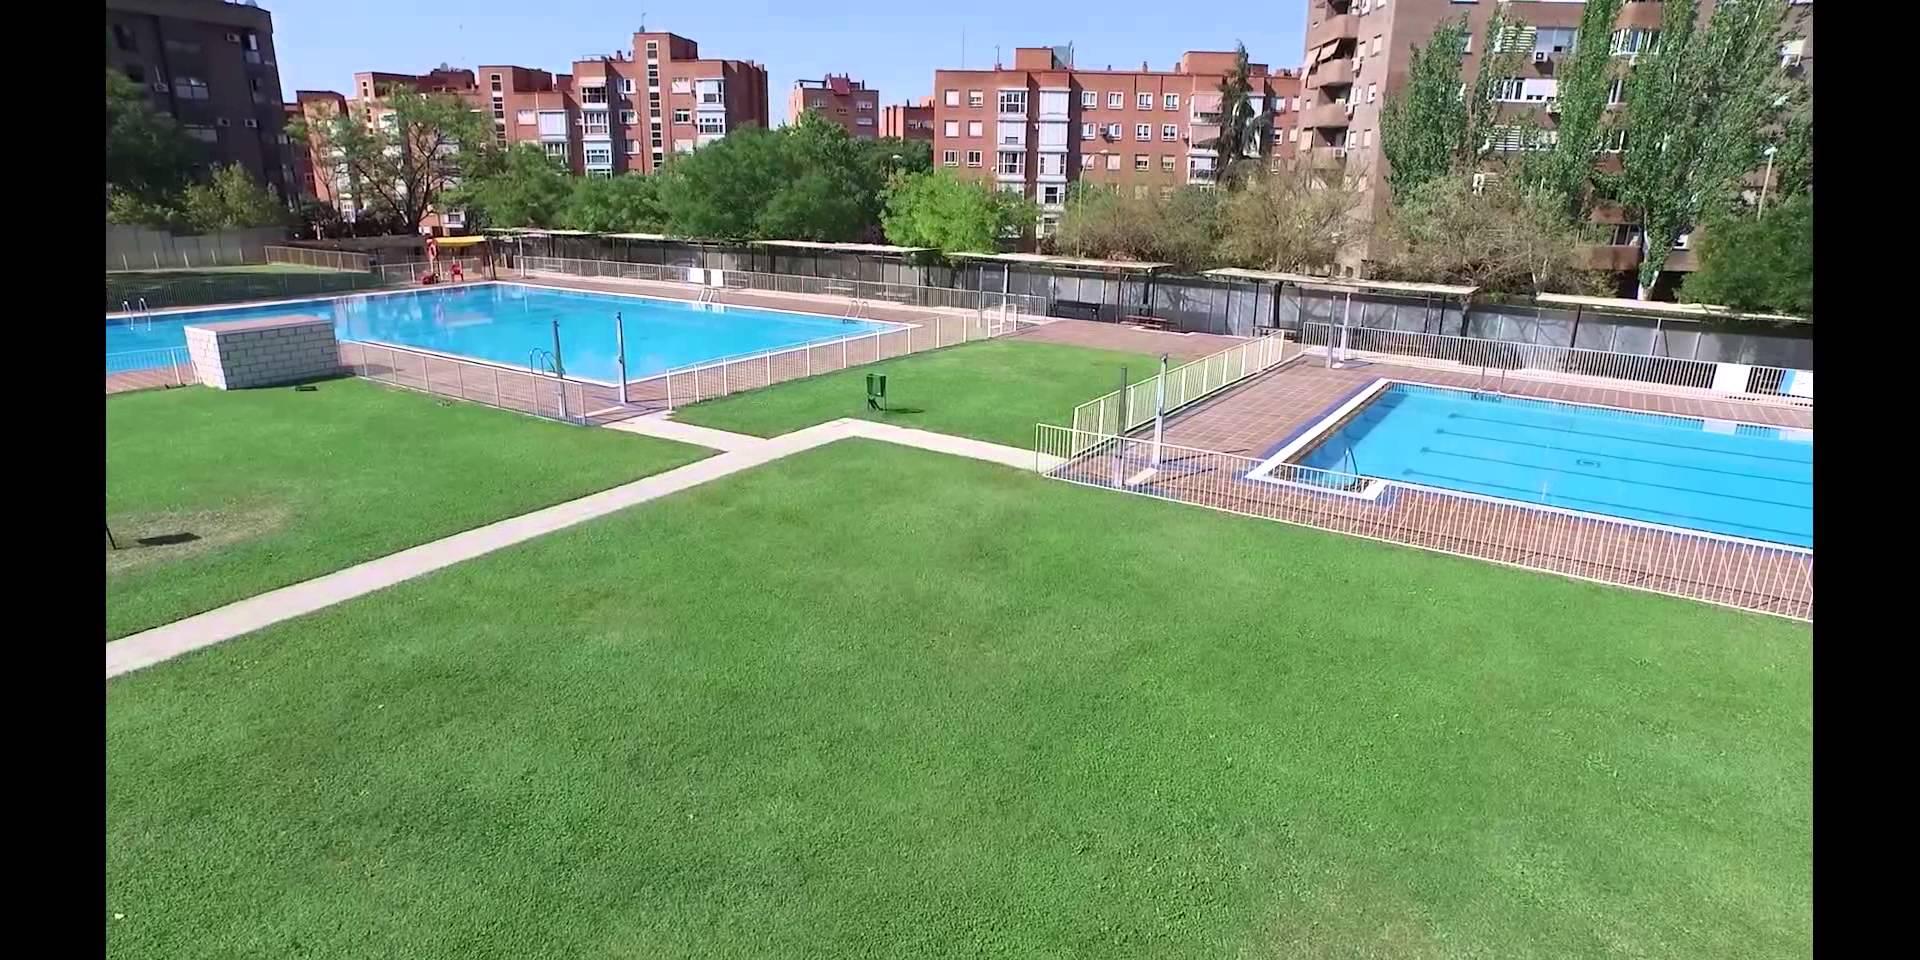 Las piscinas municipales abren hoy con entrada gratuita for Piscina vicente del bosque